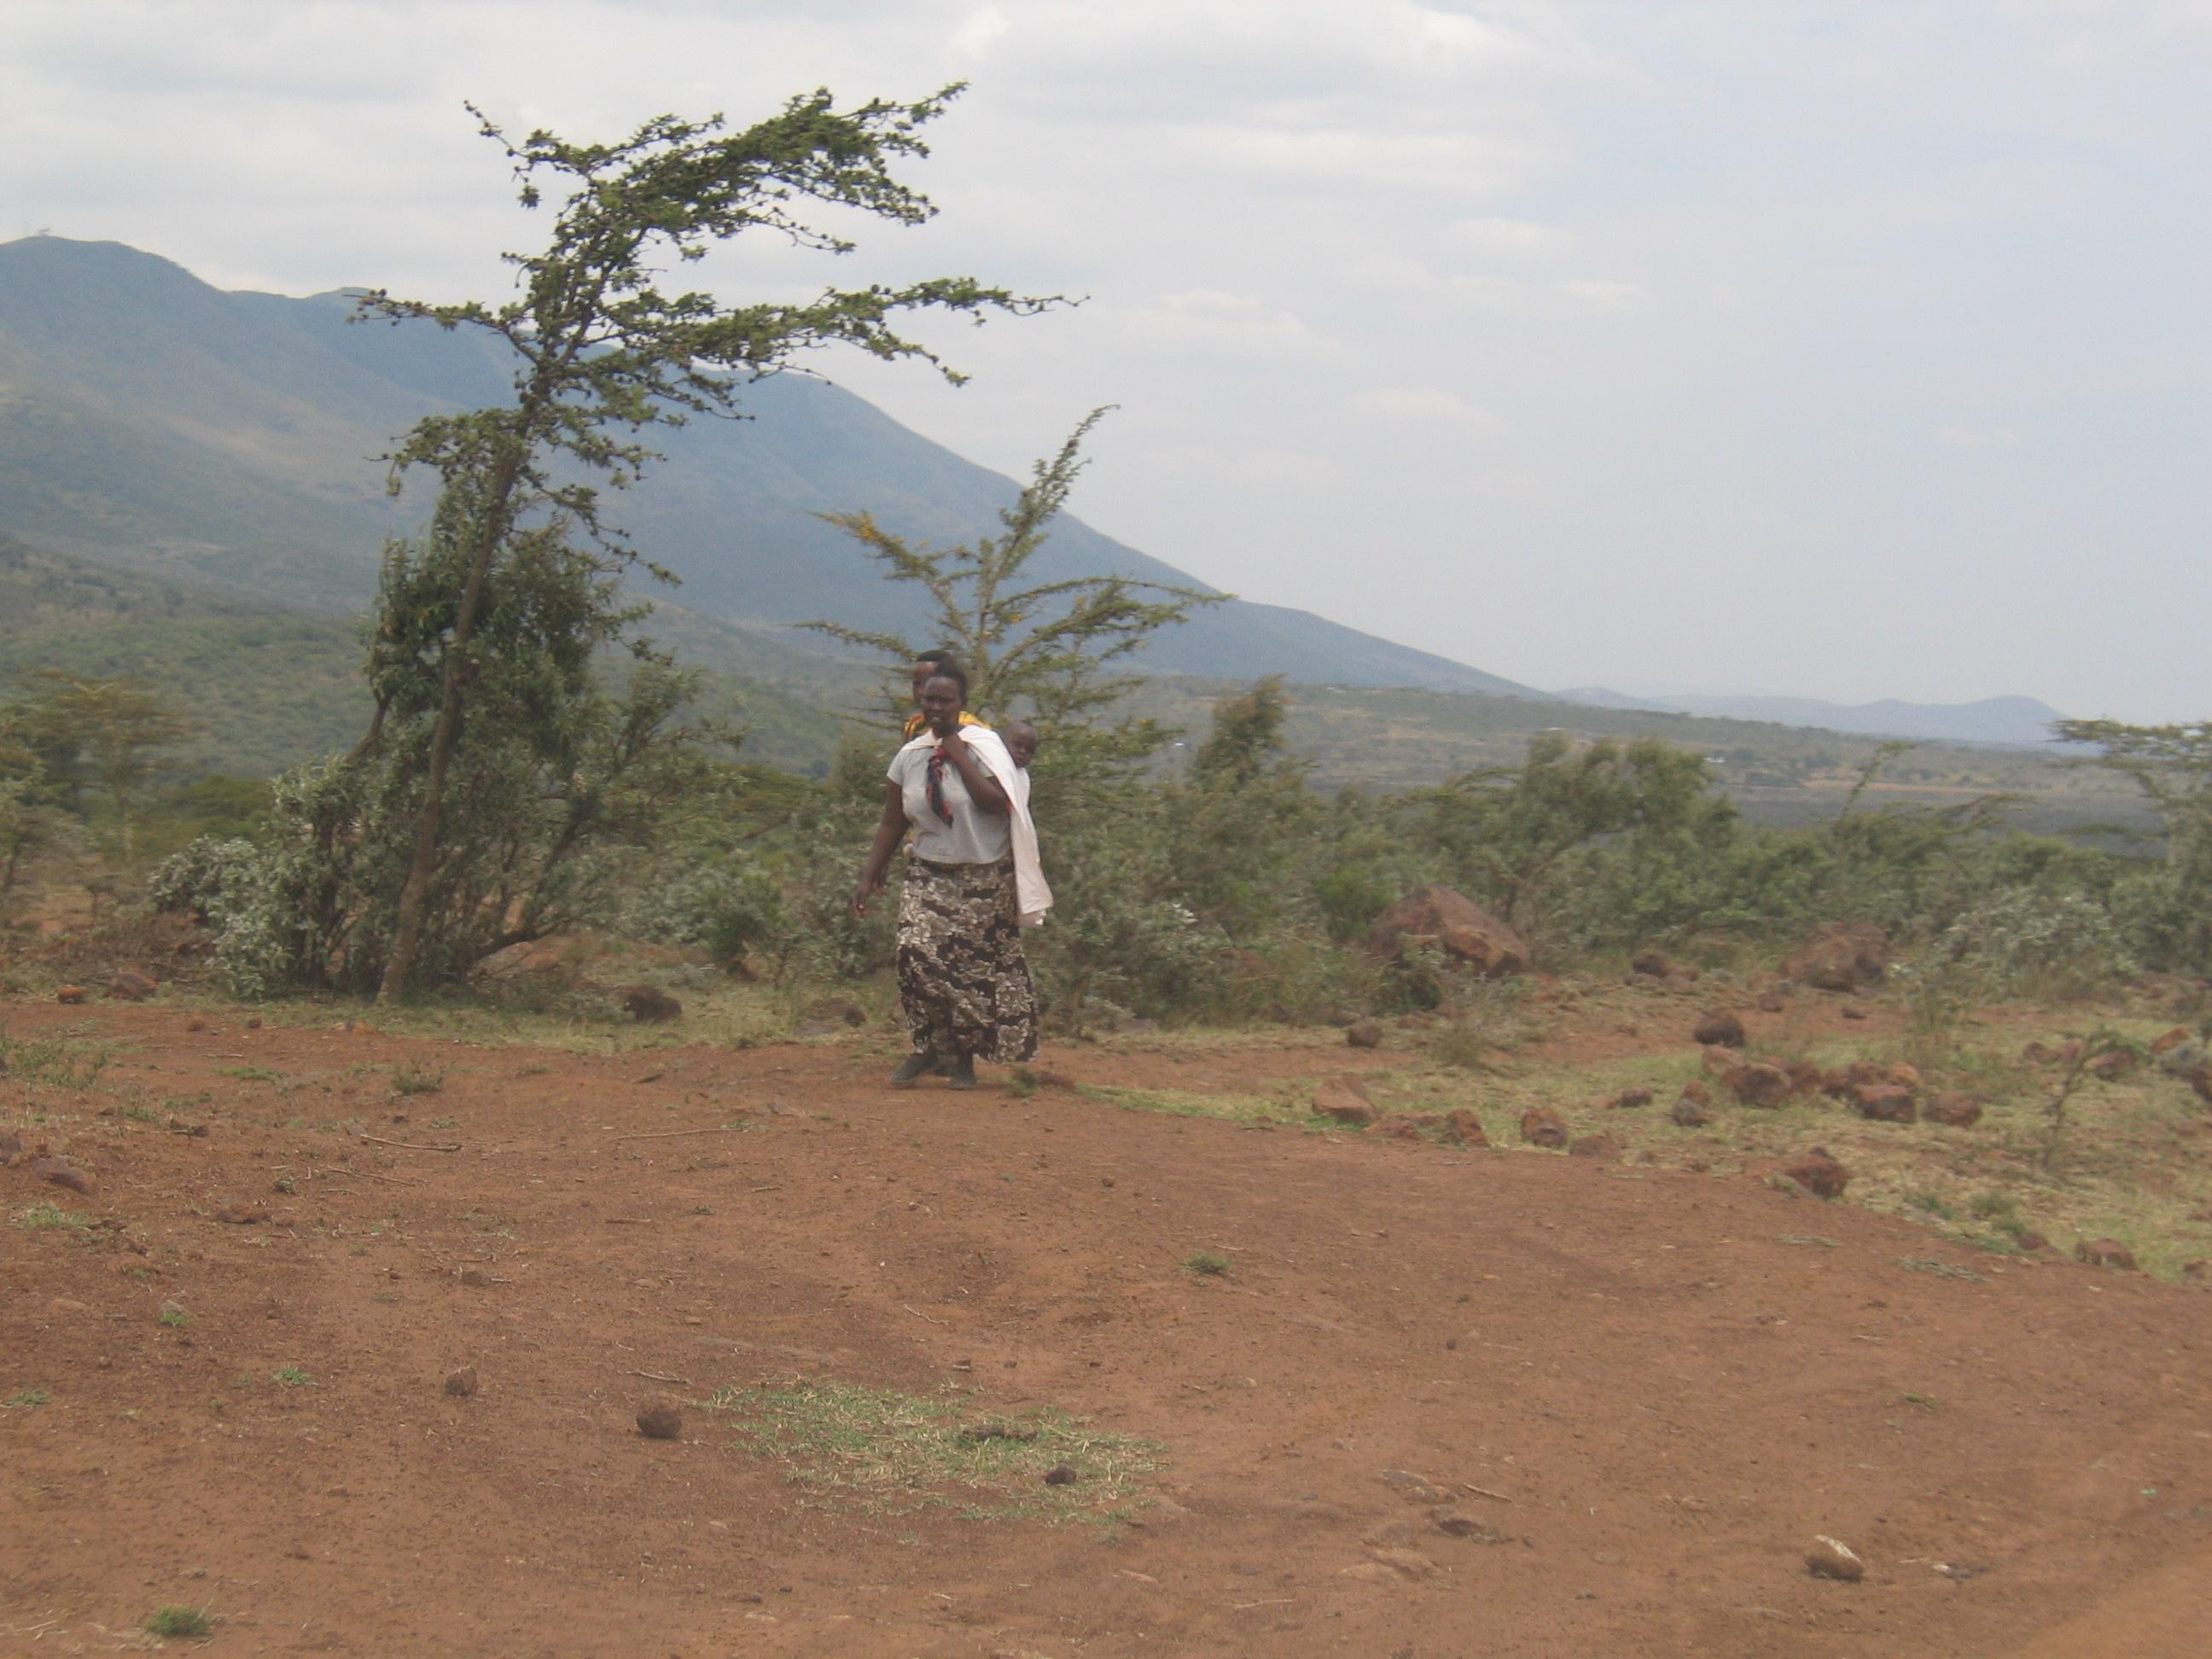 kenya_riftvalley_landscape_05